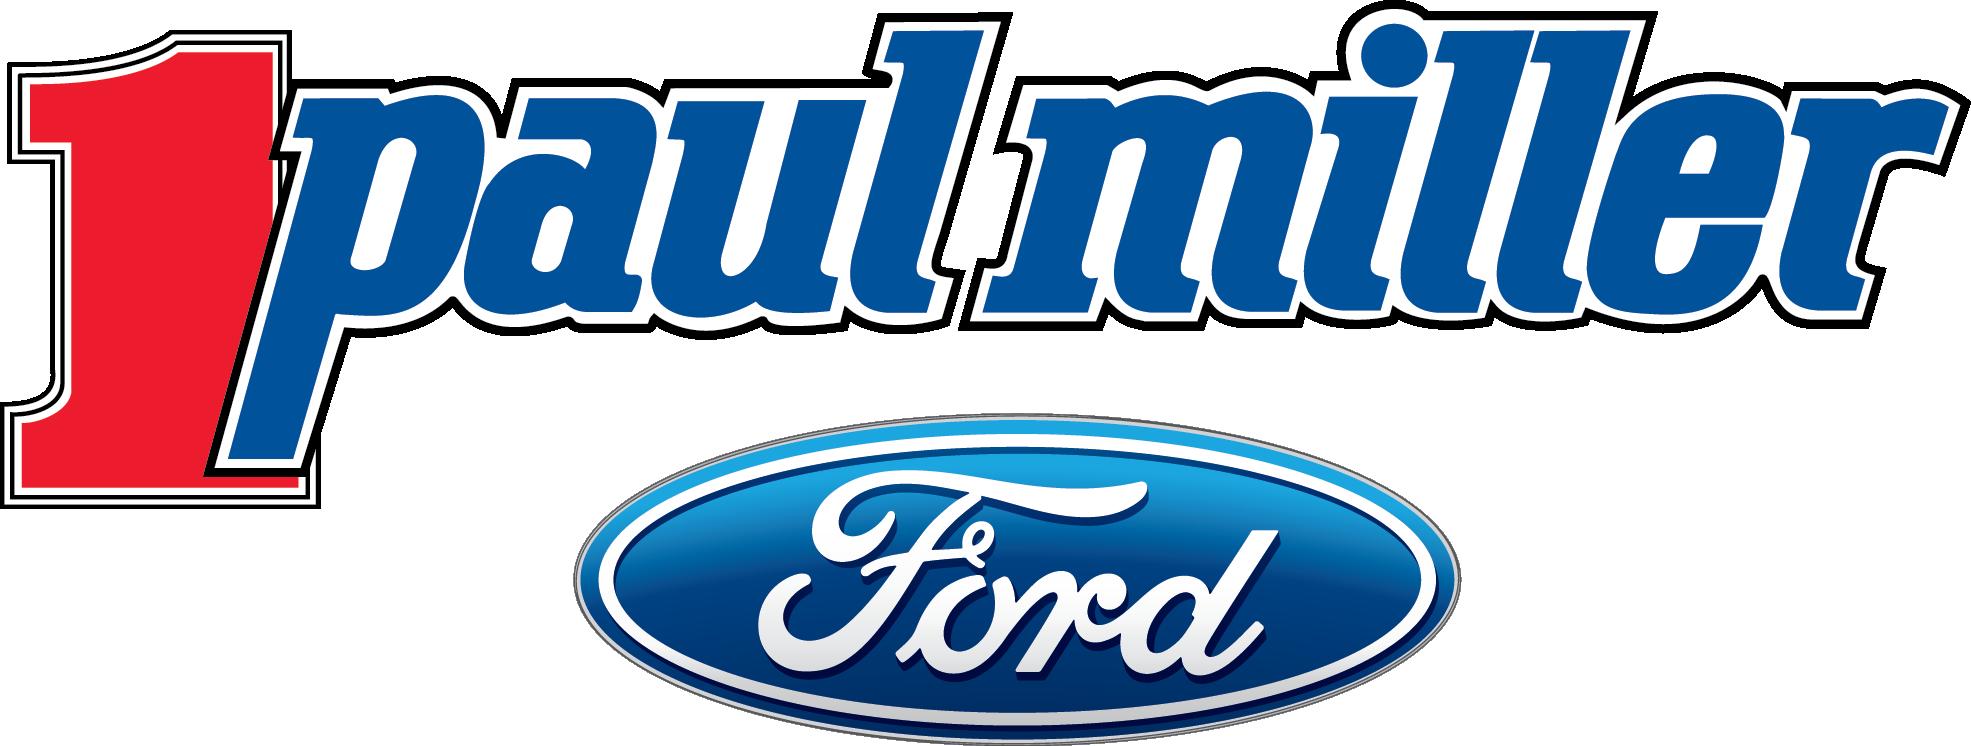 Paul_Miller_Ford_No_Tagline